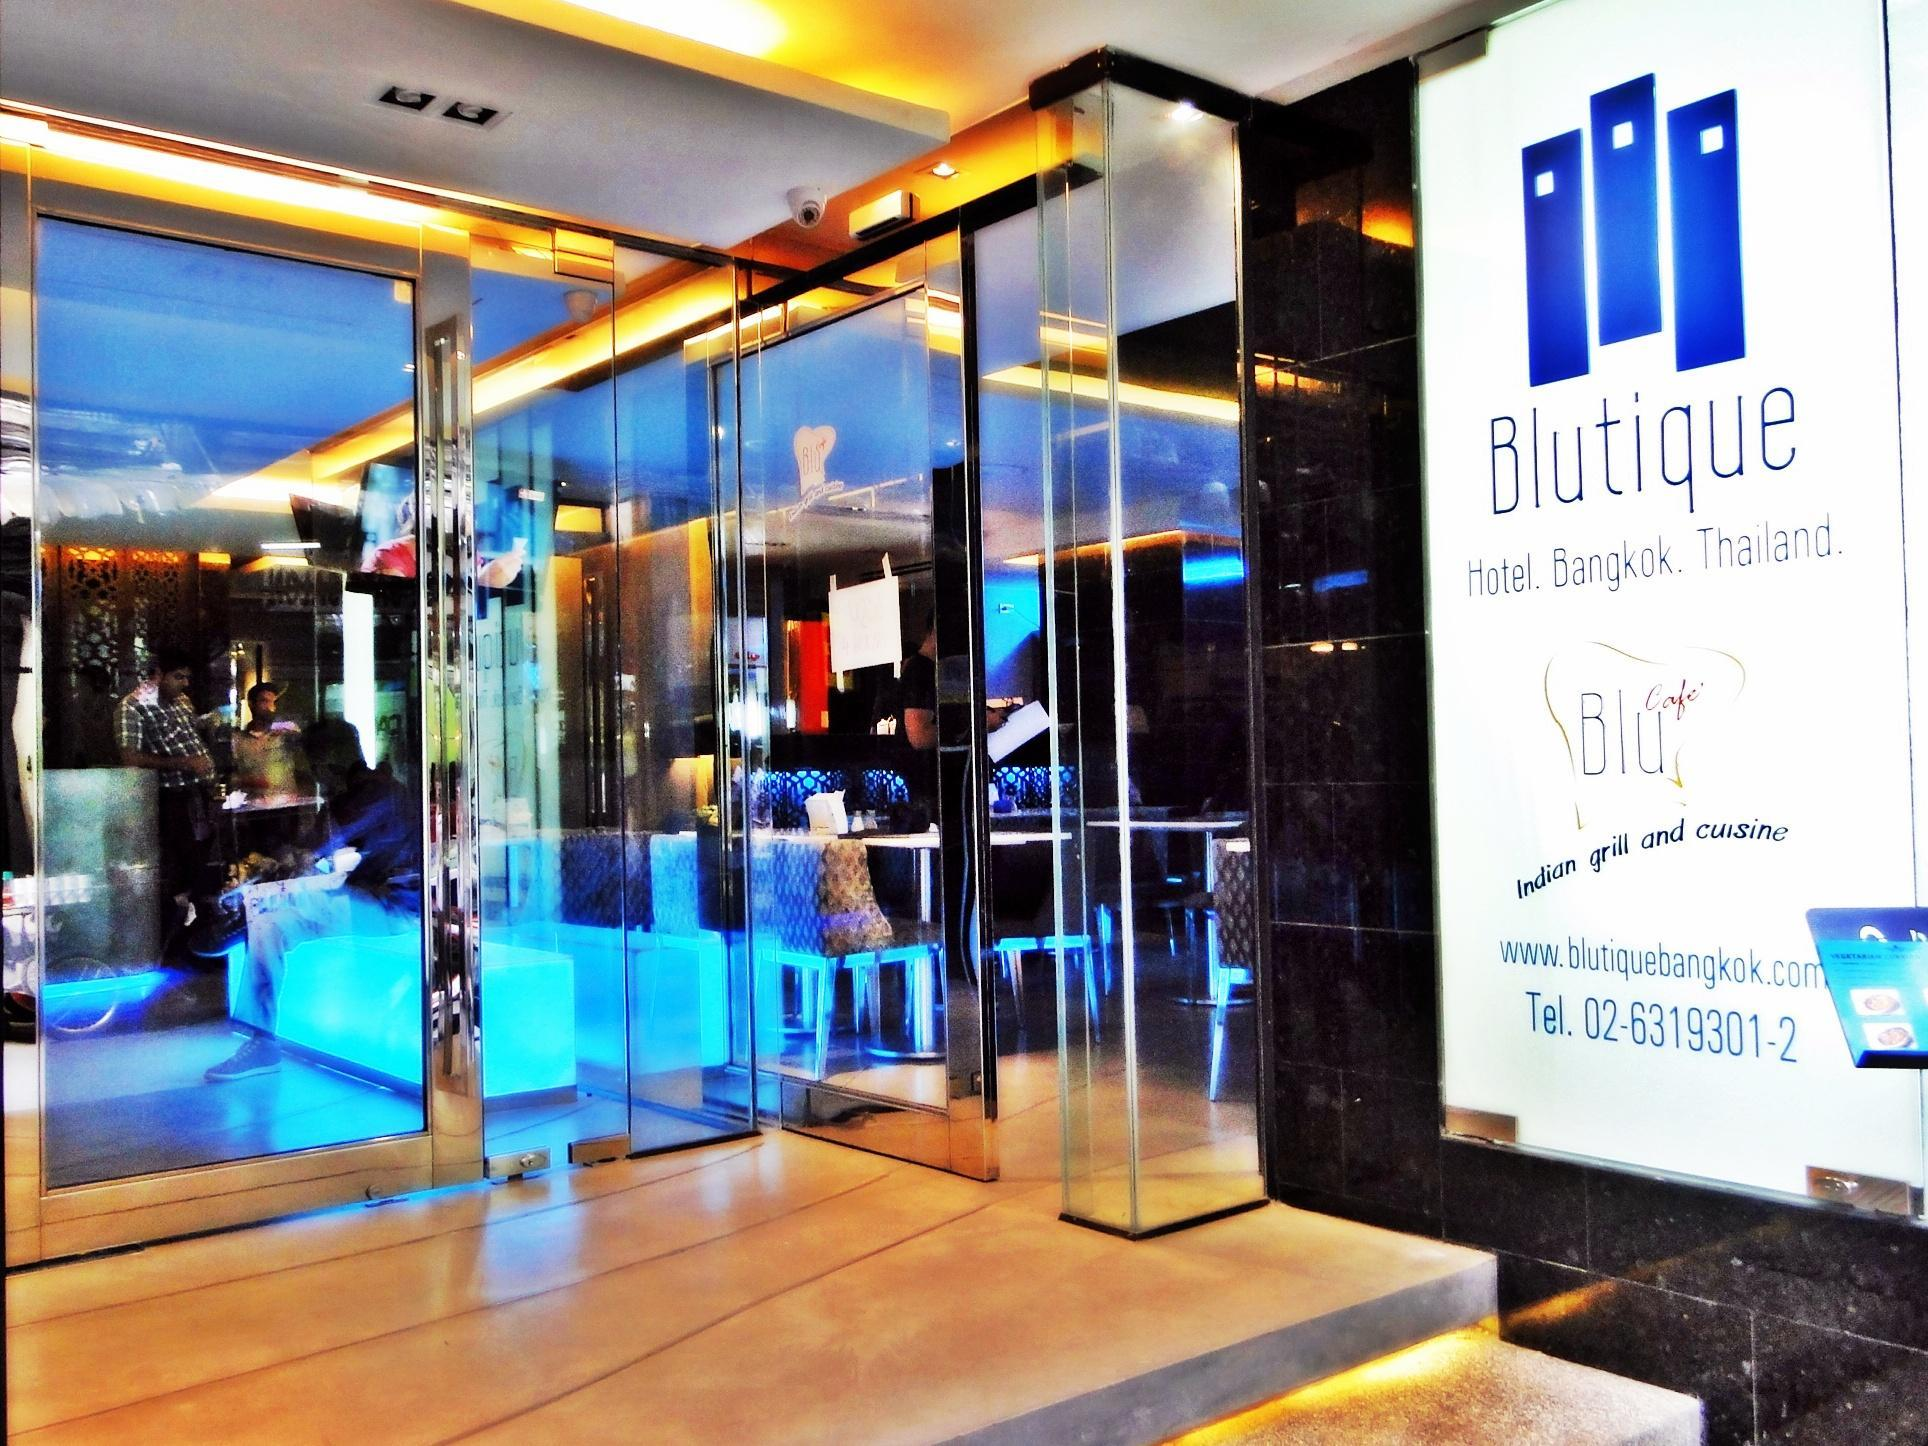 Blutique Hotel